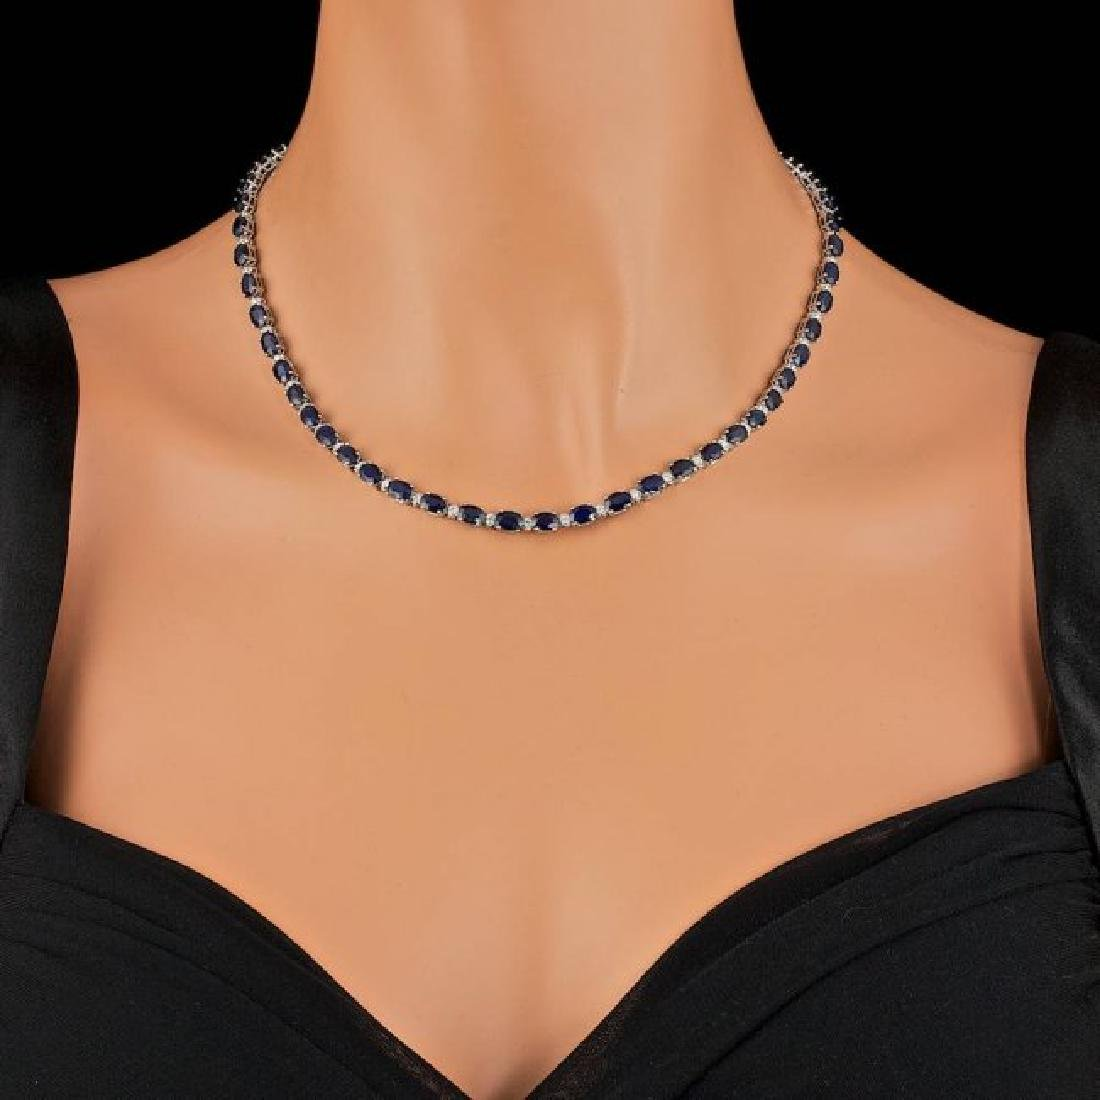 14k Gold 30.00ct Sapphire 1.35ct Diamond Necklace - 4